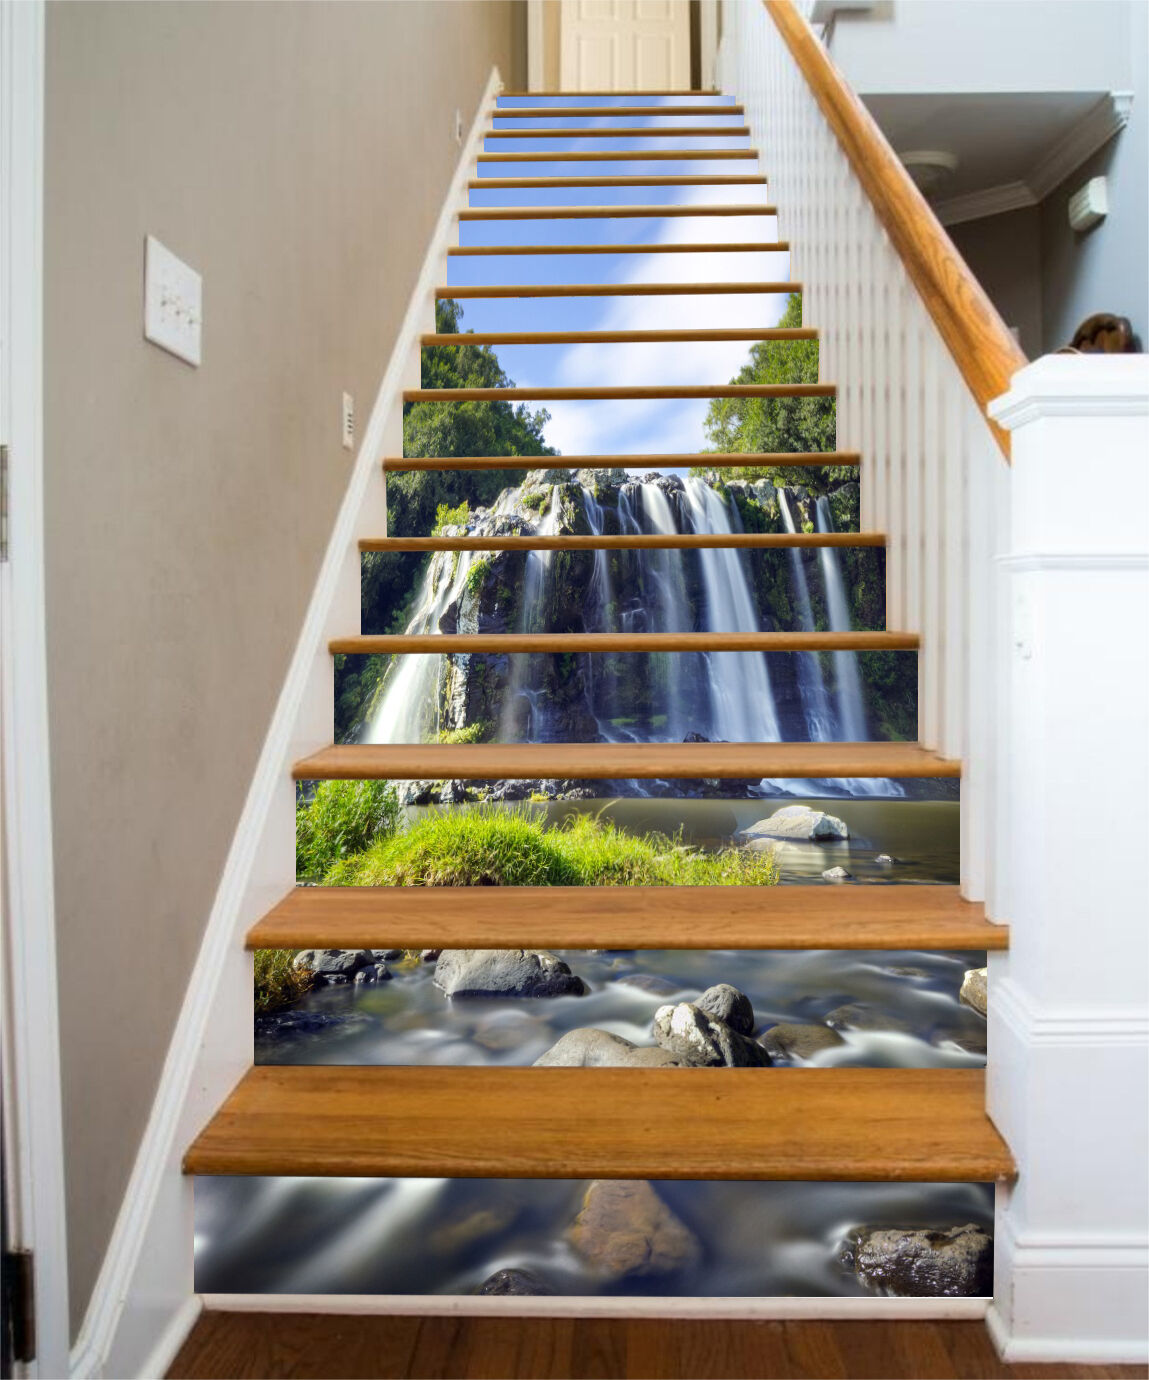 3D Wasserfall 567 Stair Risers Dekoration Fototapete Vinyl Aufkleber Tapete DE